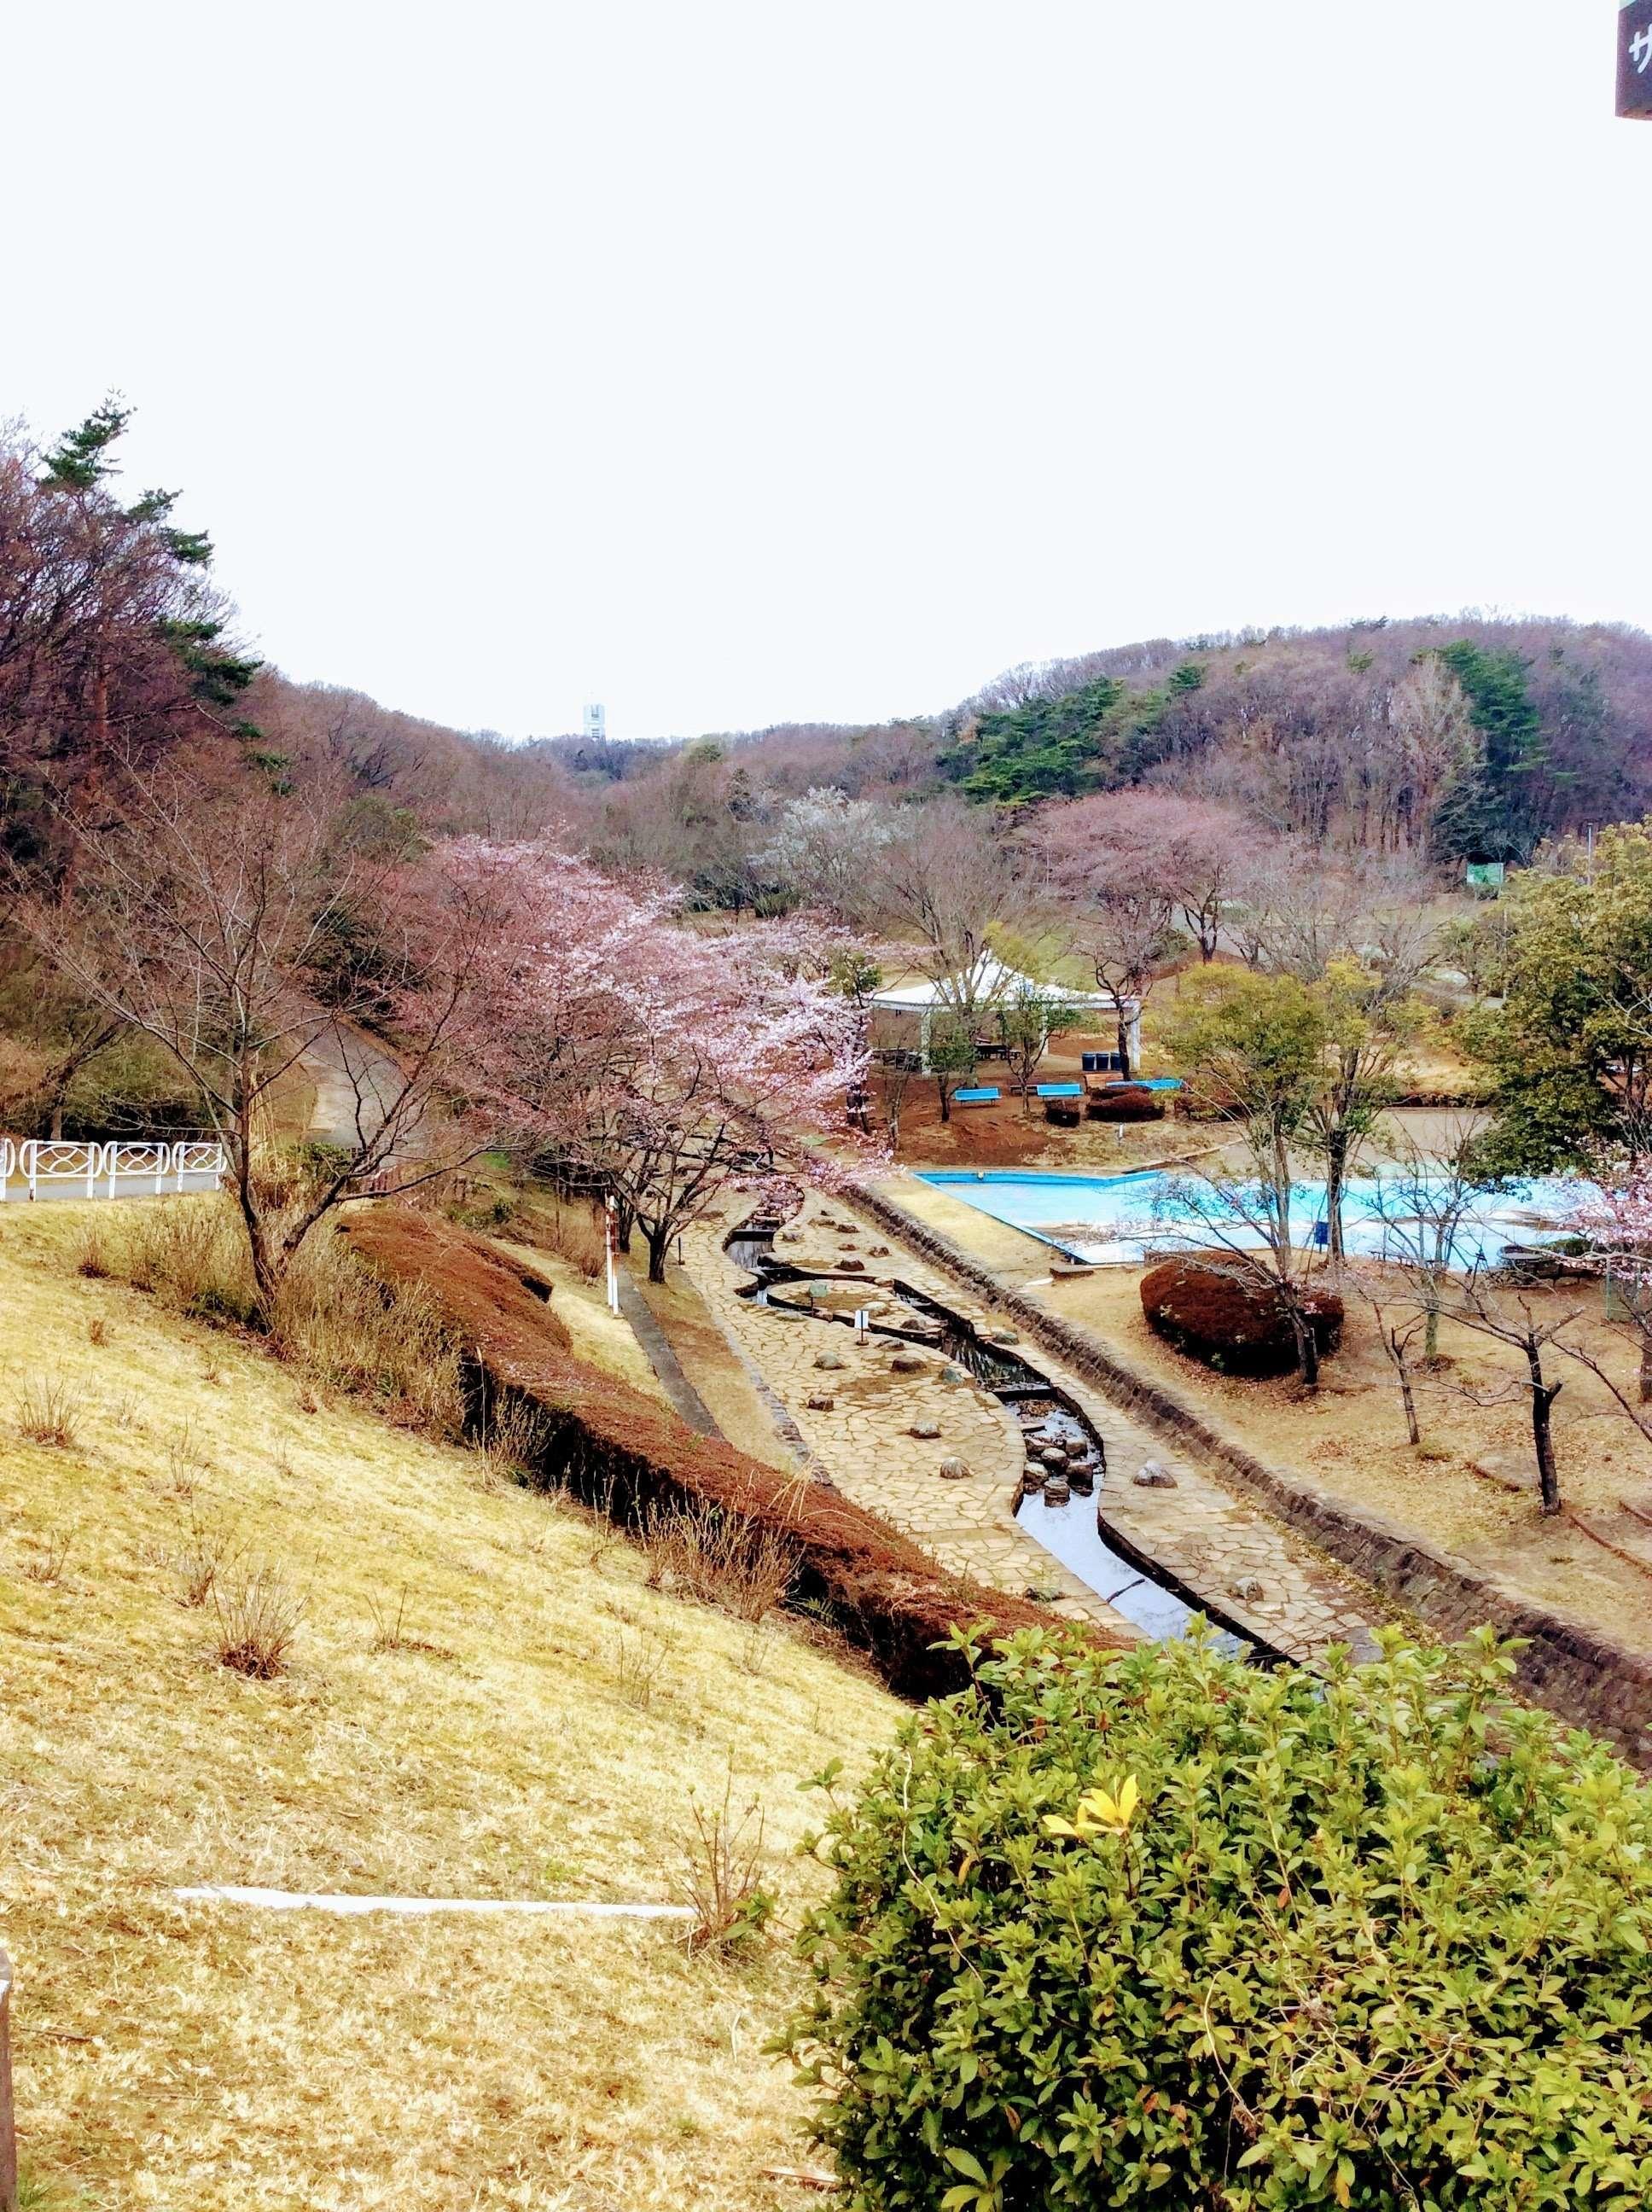 Wading river and splash pool at Saitama Children's Zoo